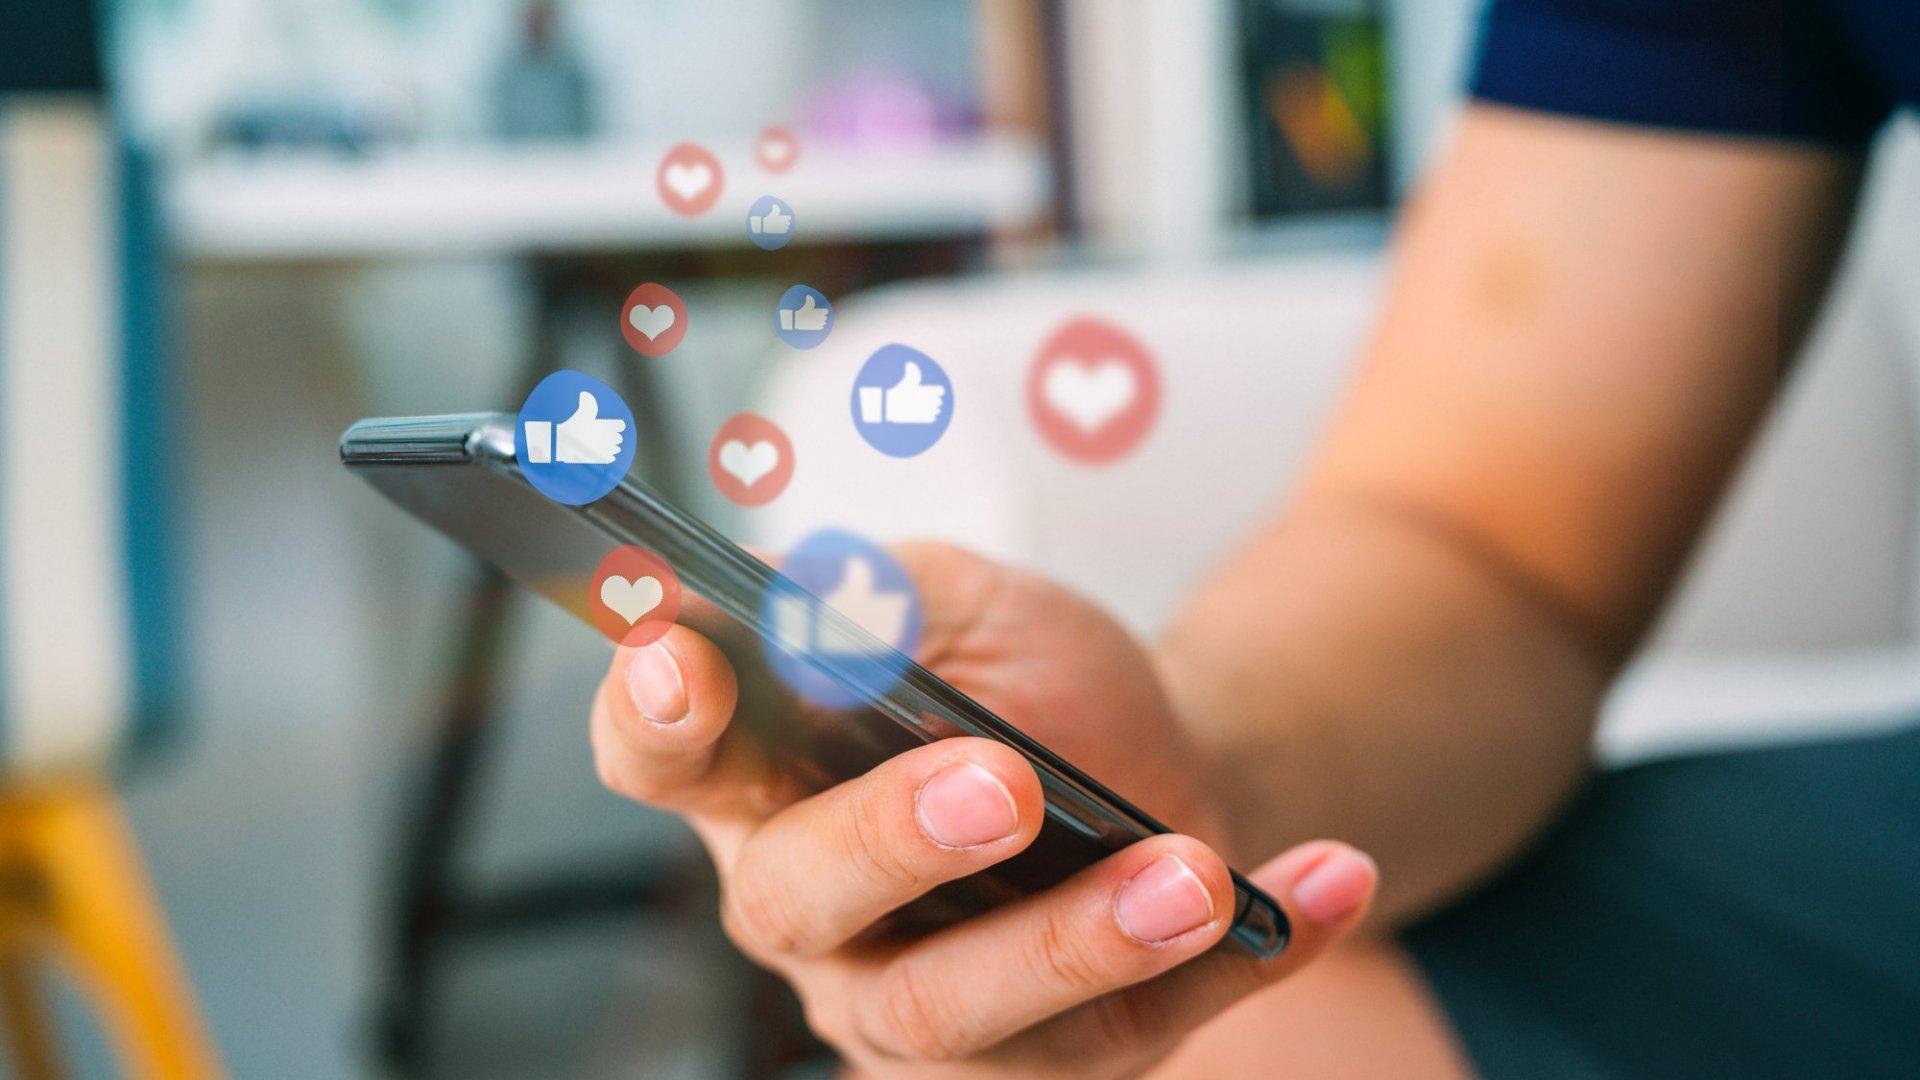 Avantajele și capcanele social media și pediatrie